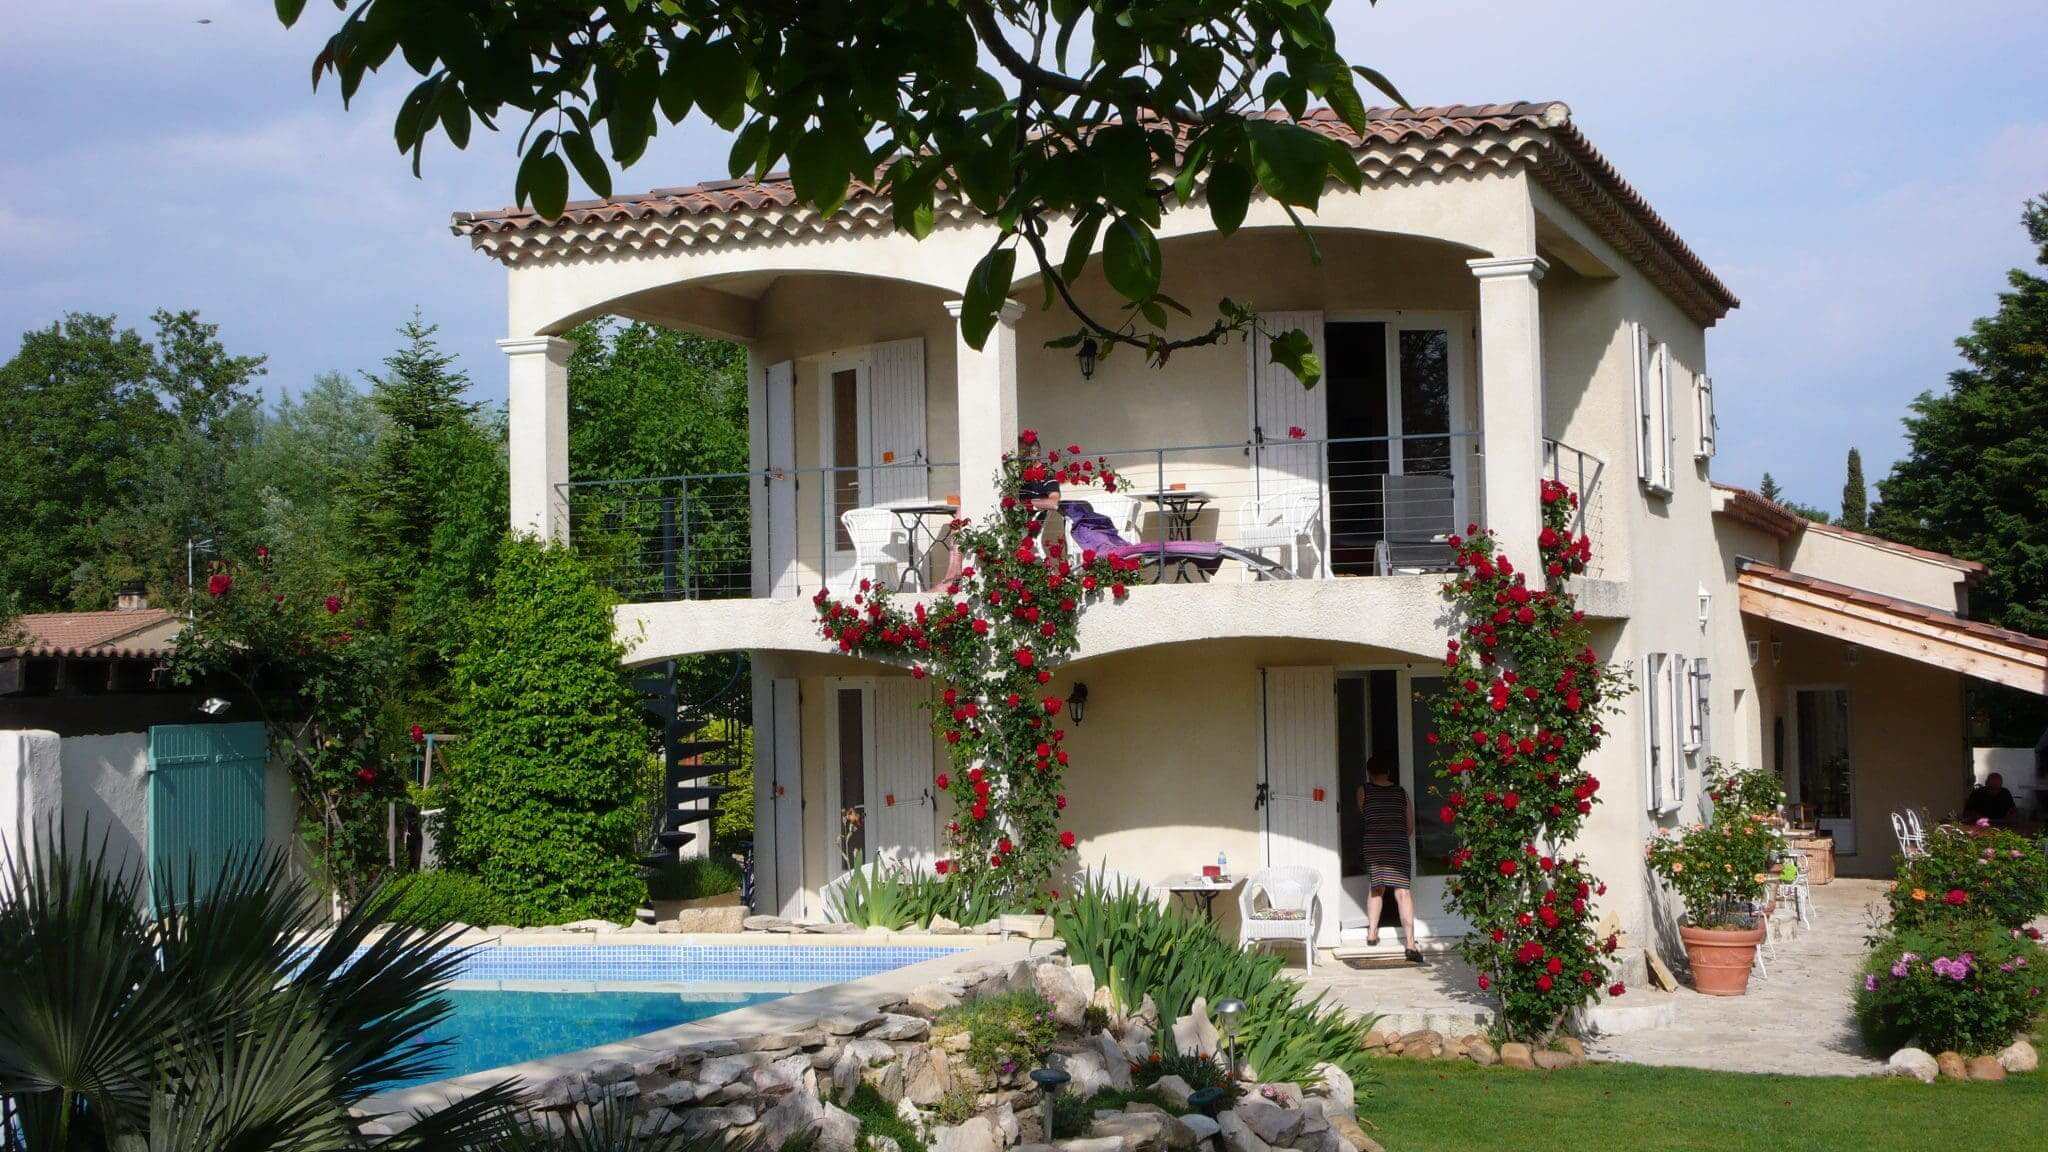 Hotel Maison Blum Provence